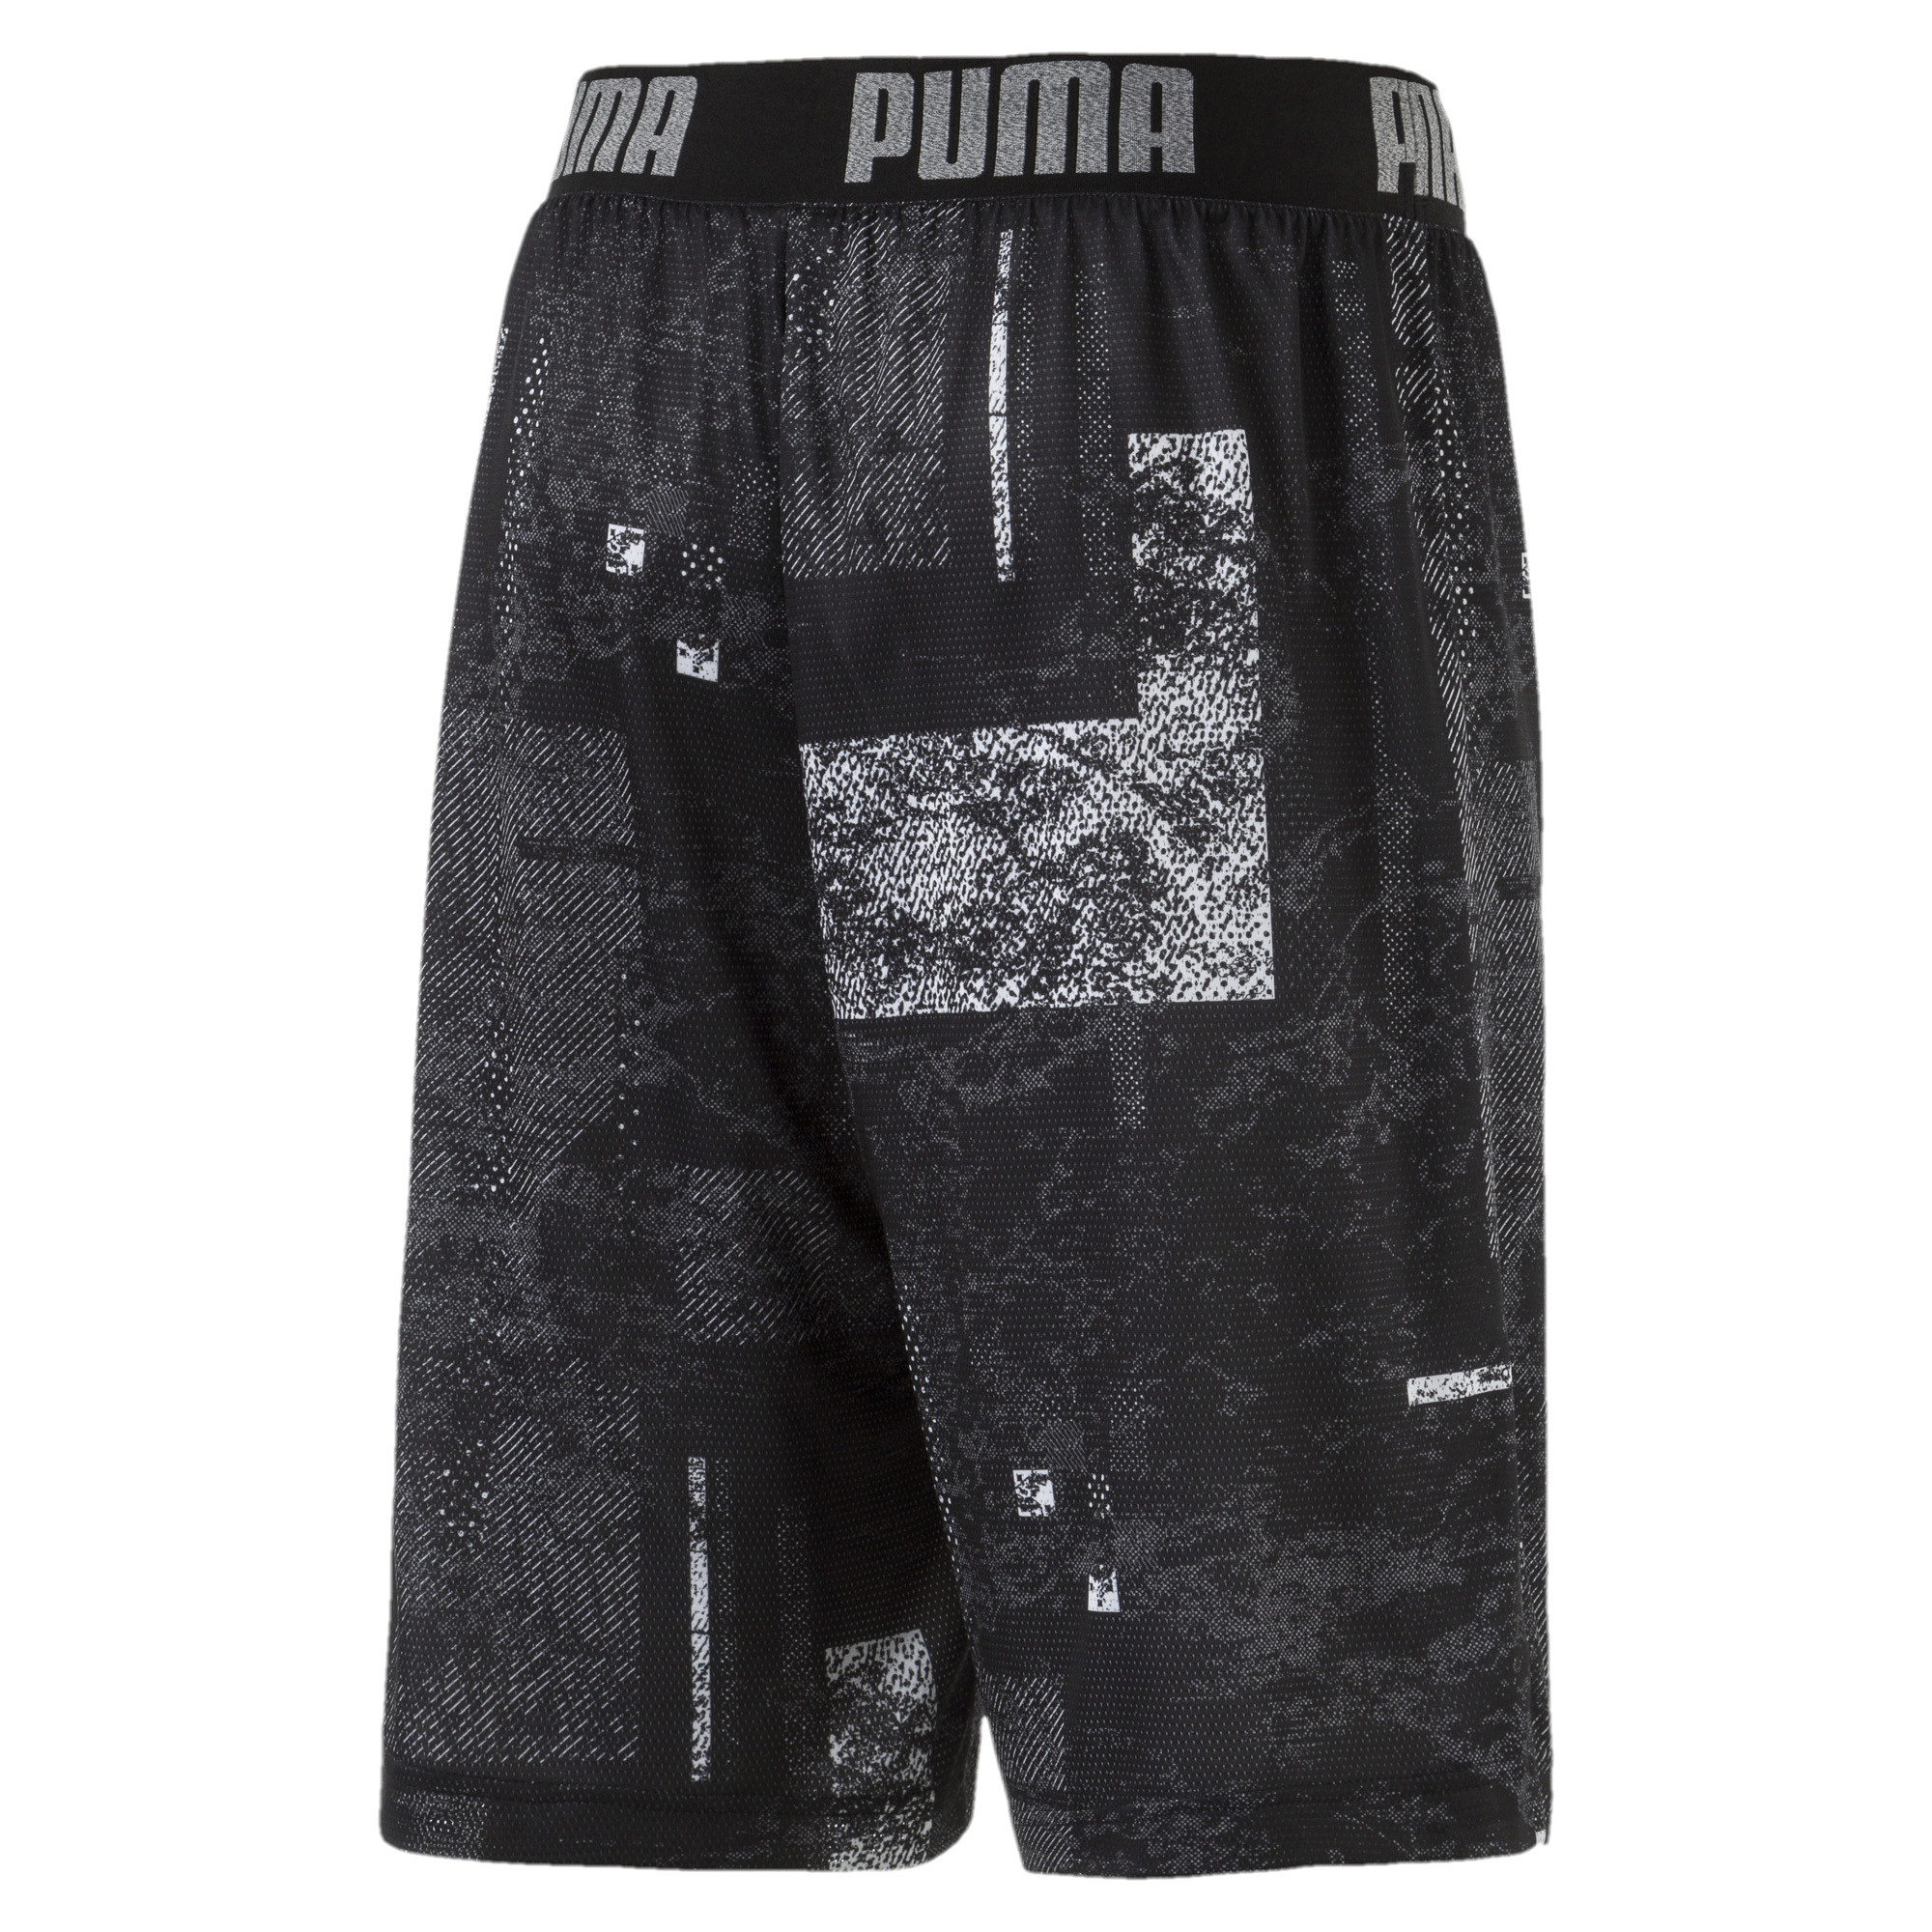 Image Puma Men's Active Training Reversible Shorts #2